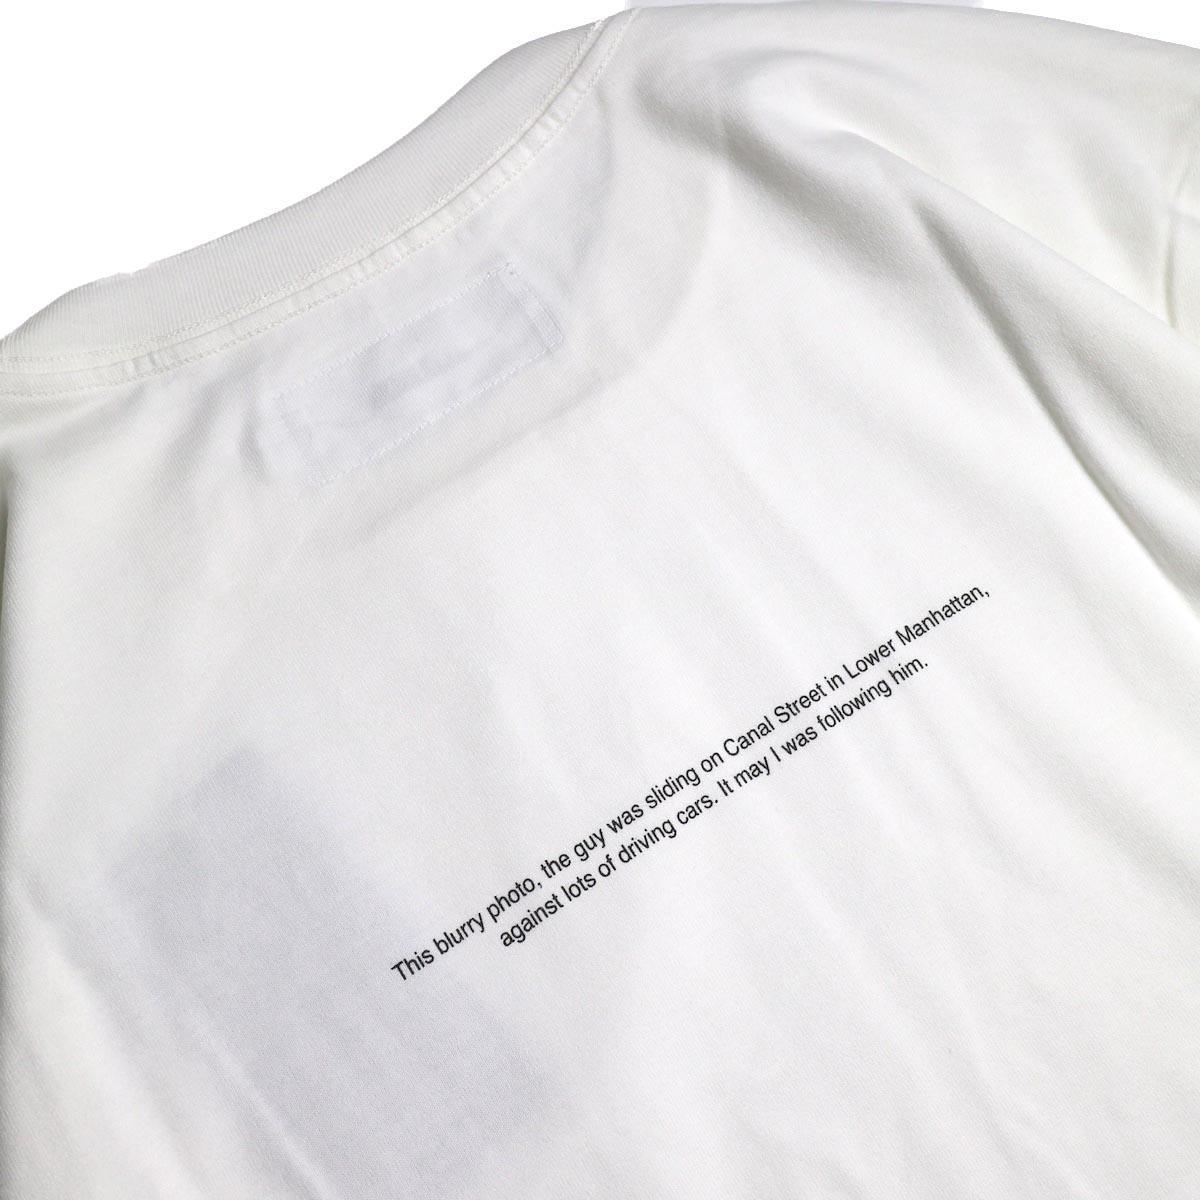 JANE SMITH / Print Tee (KERRY GETZ & JASON DULL,CANAL STREET IN THE RAIN S/S) -White背面プリント